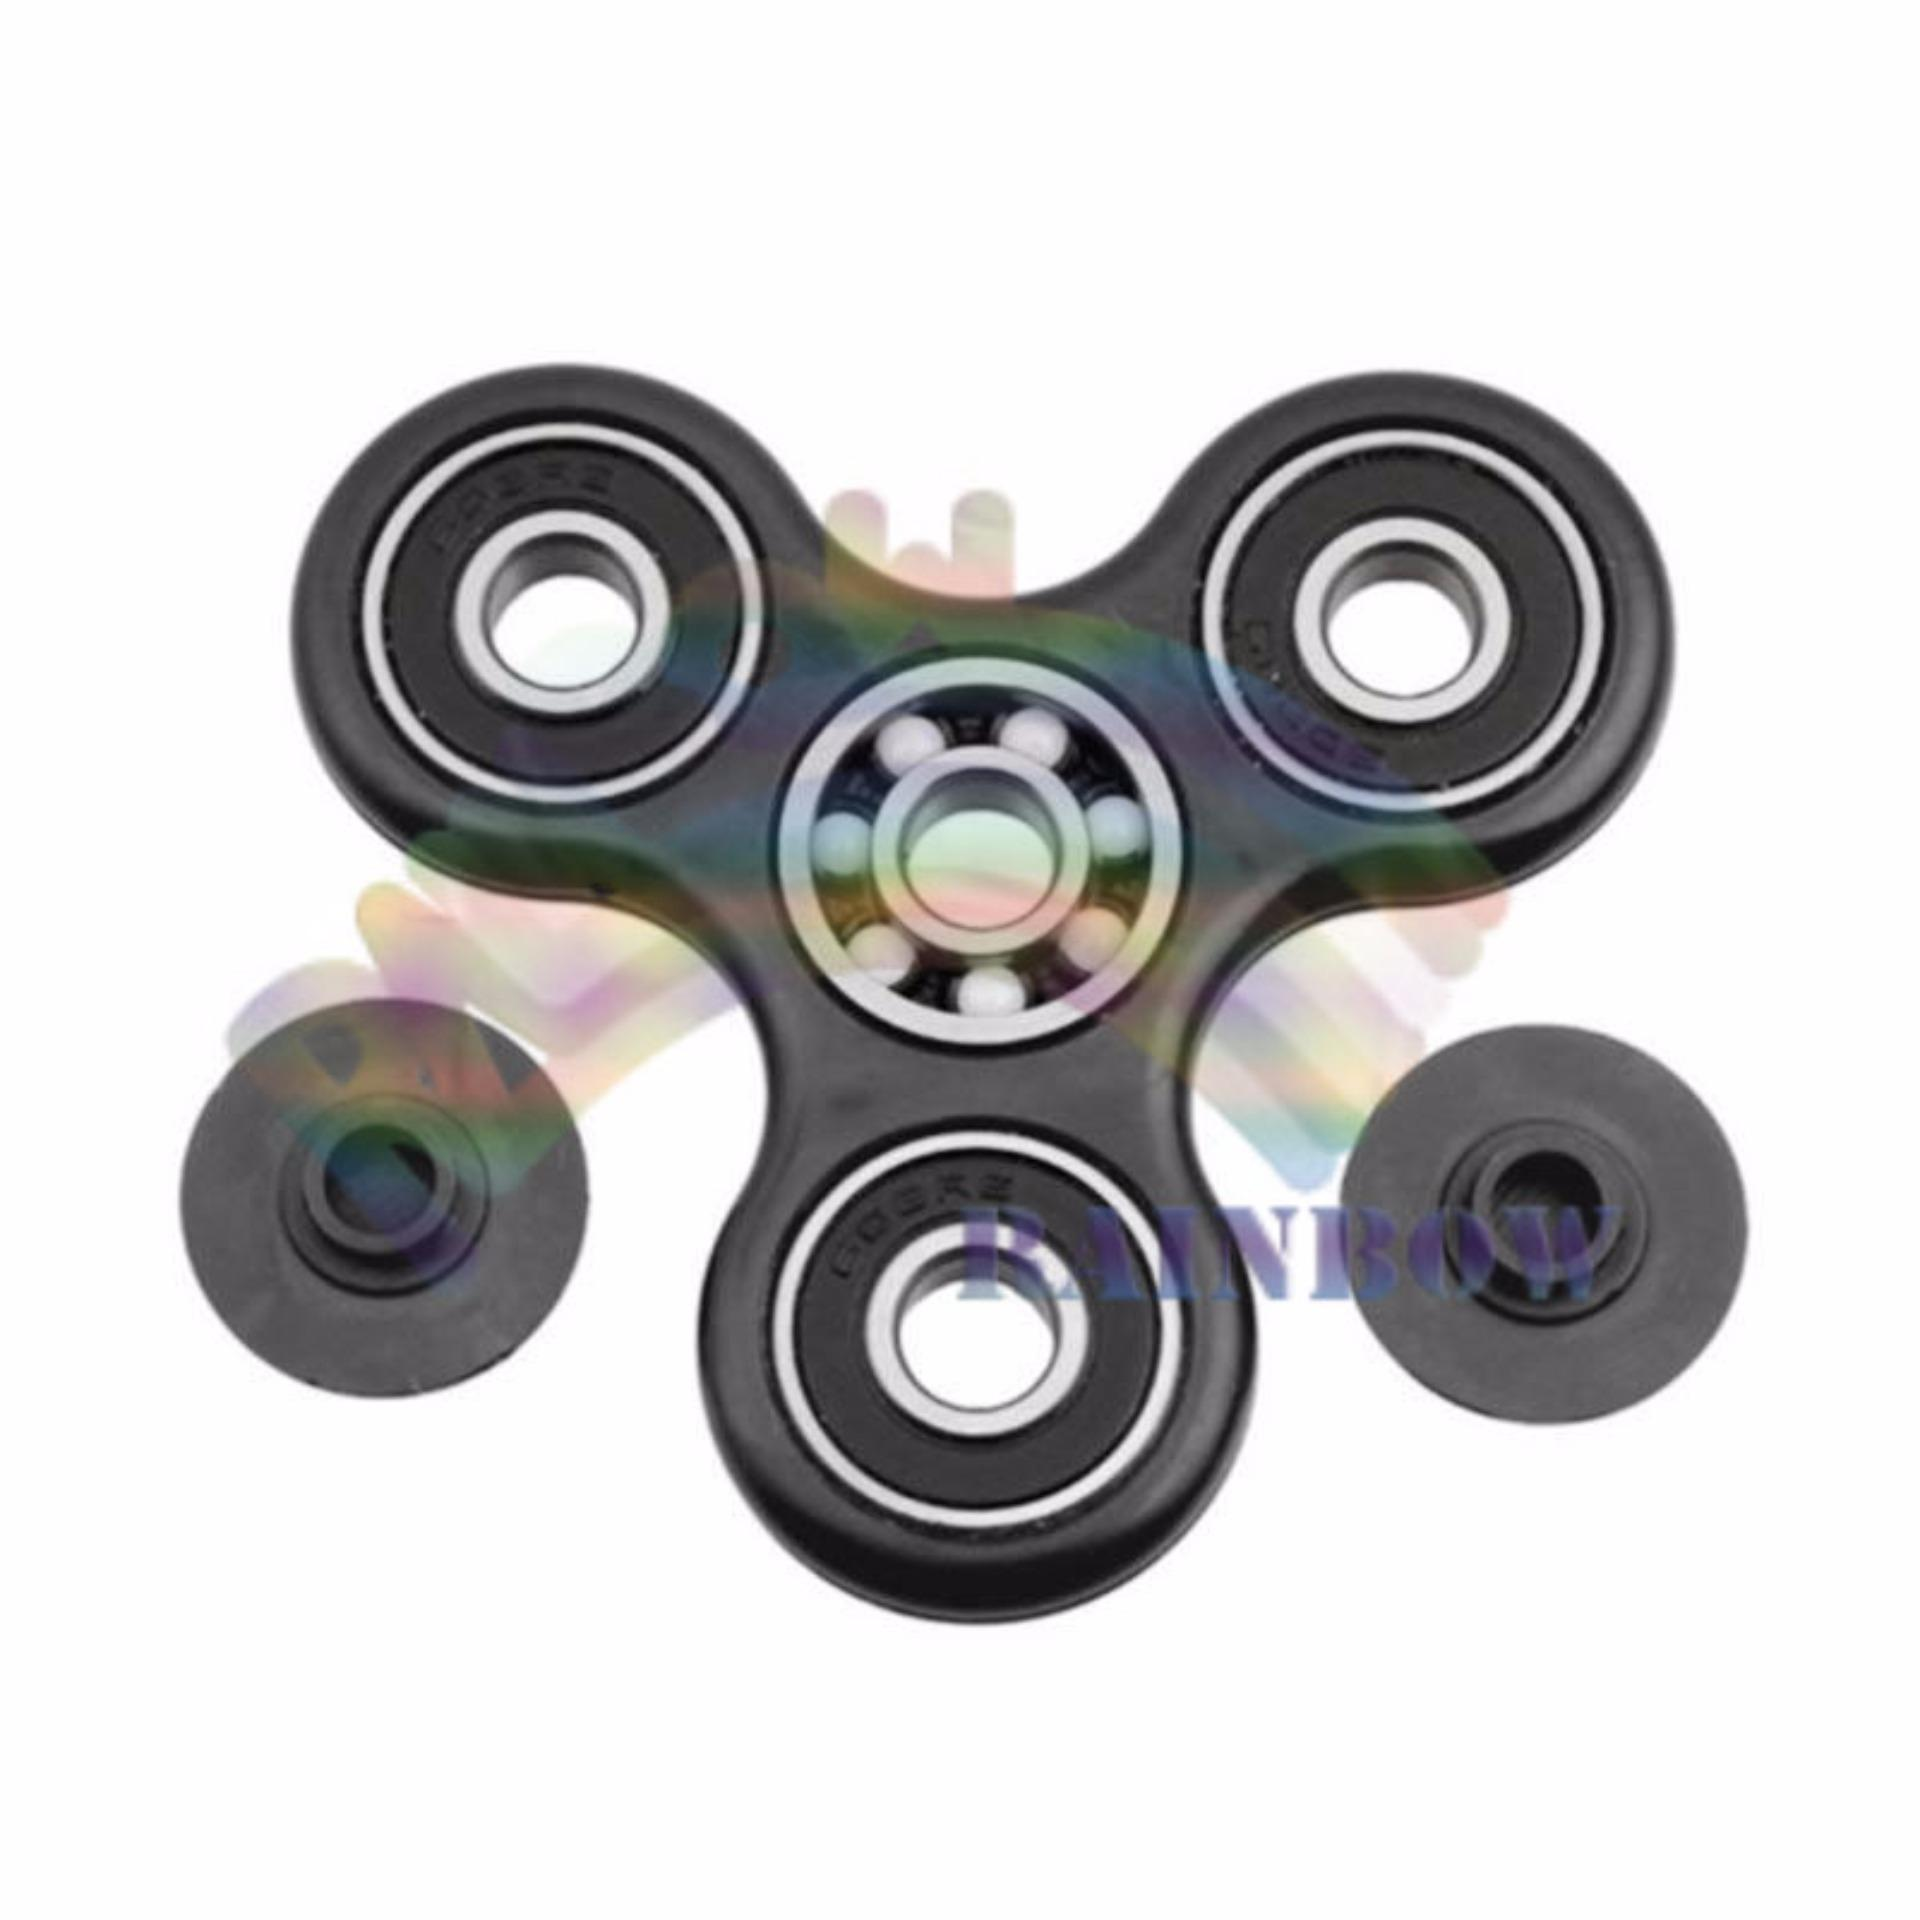 ... Rainbow Fidget Spinner Hand Toys Mainan Tri Spinner EDC Ceramic Ball / Creative Games / Funny ...